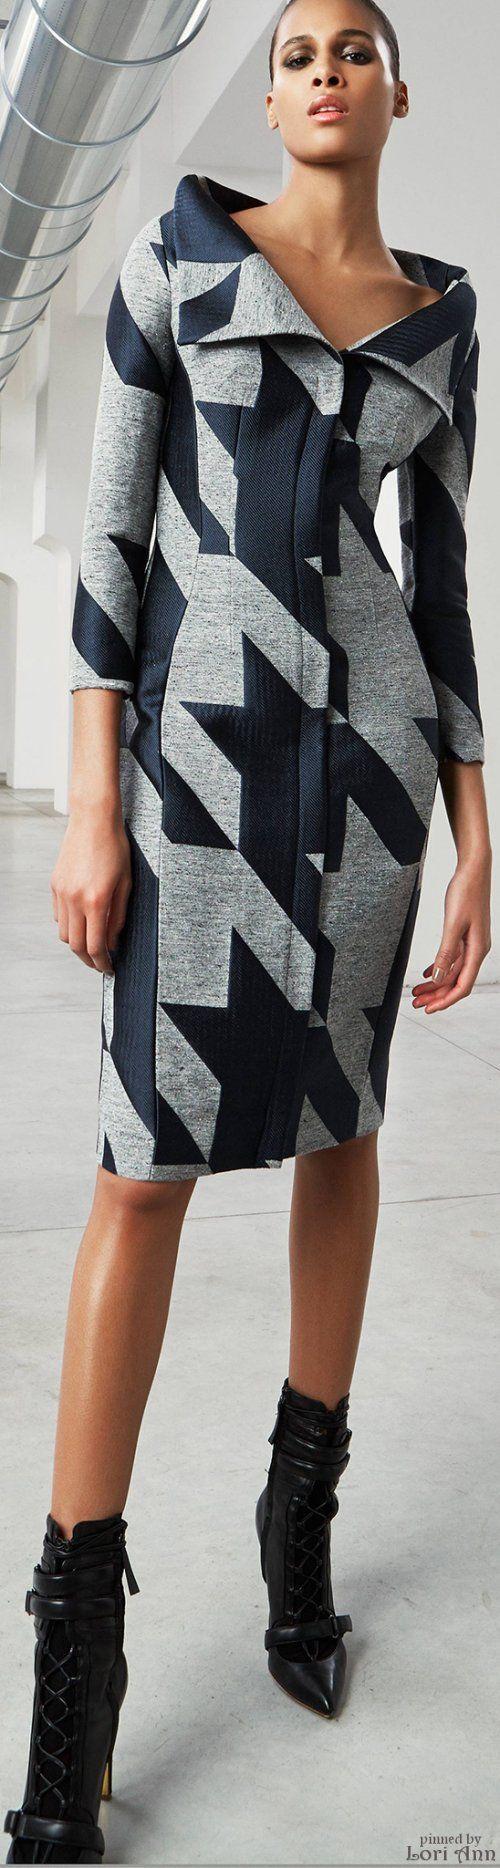 dress @roressclothes closet ideas women fashion outfit clothing style Antonio Berardi Pre-Fall 2015: